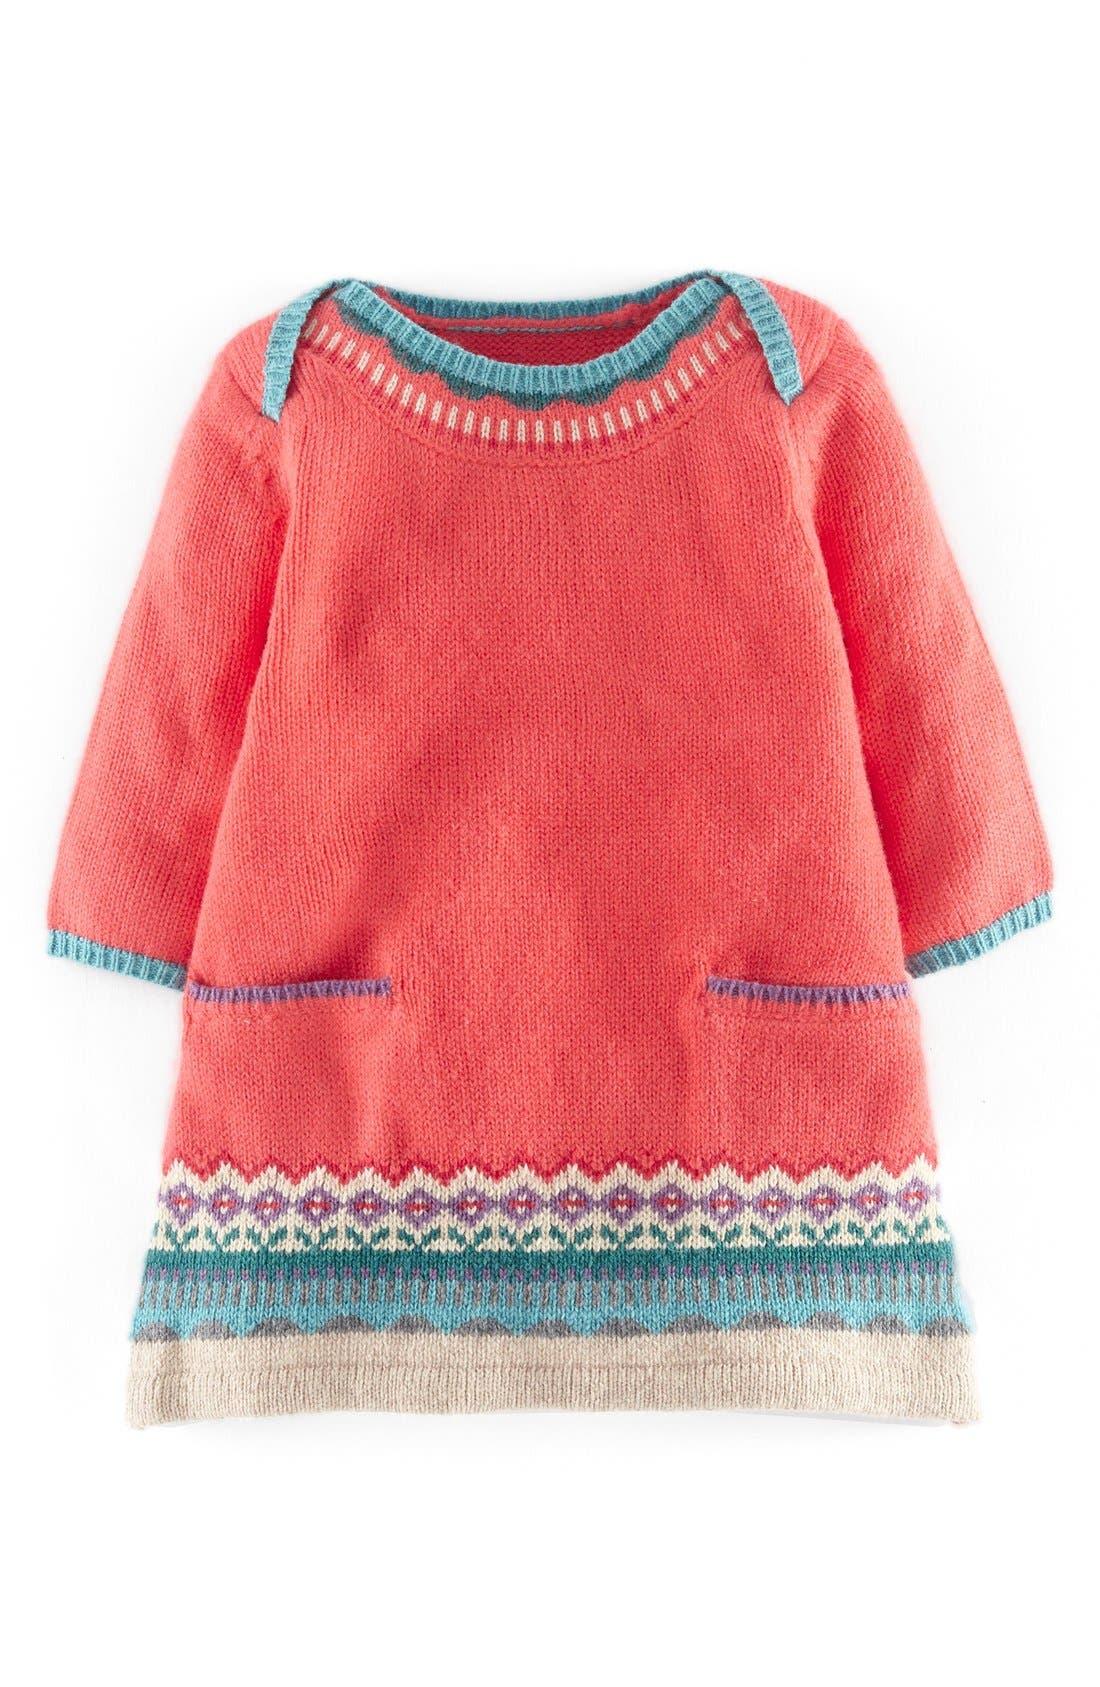 Mini Boden Fair Isle Knit Sweater Dress (Baby Girls)   Nordstrom